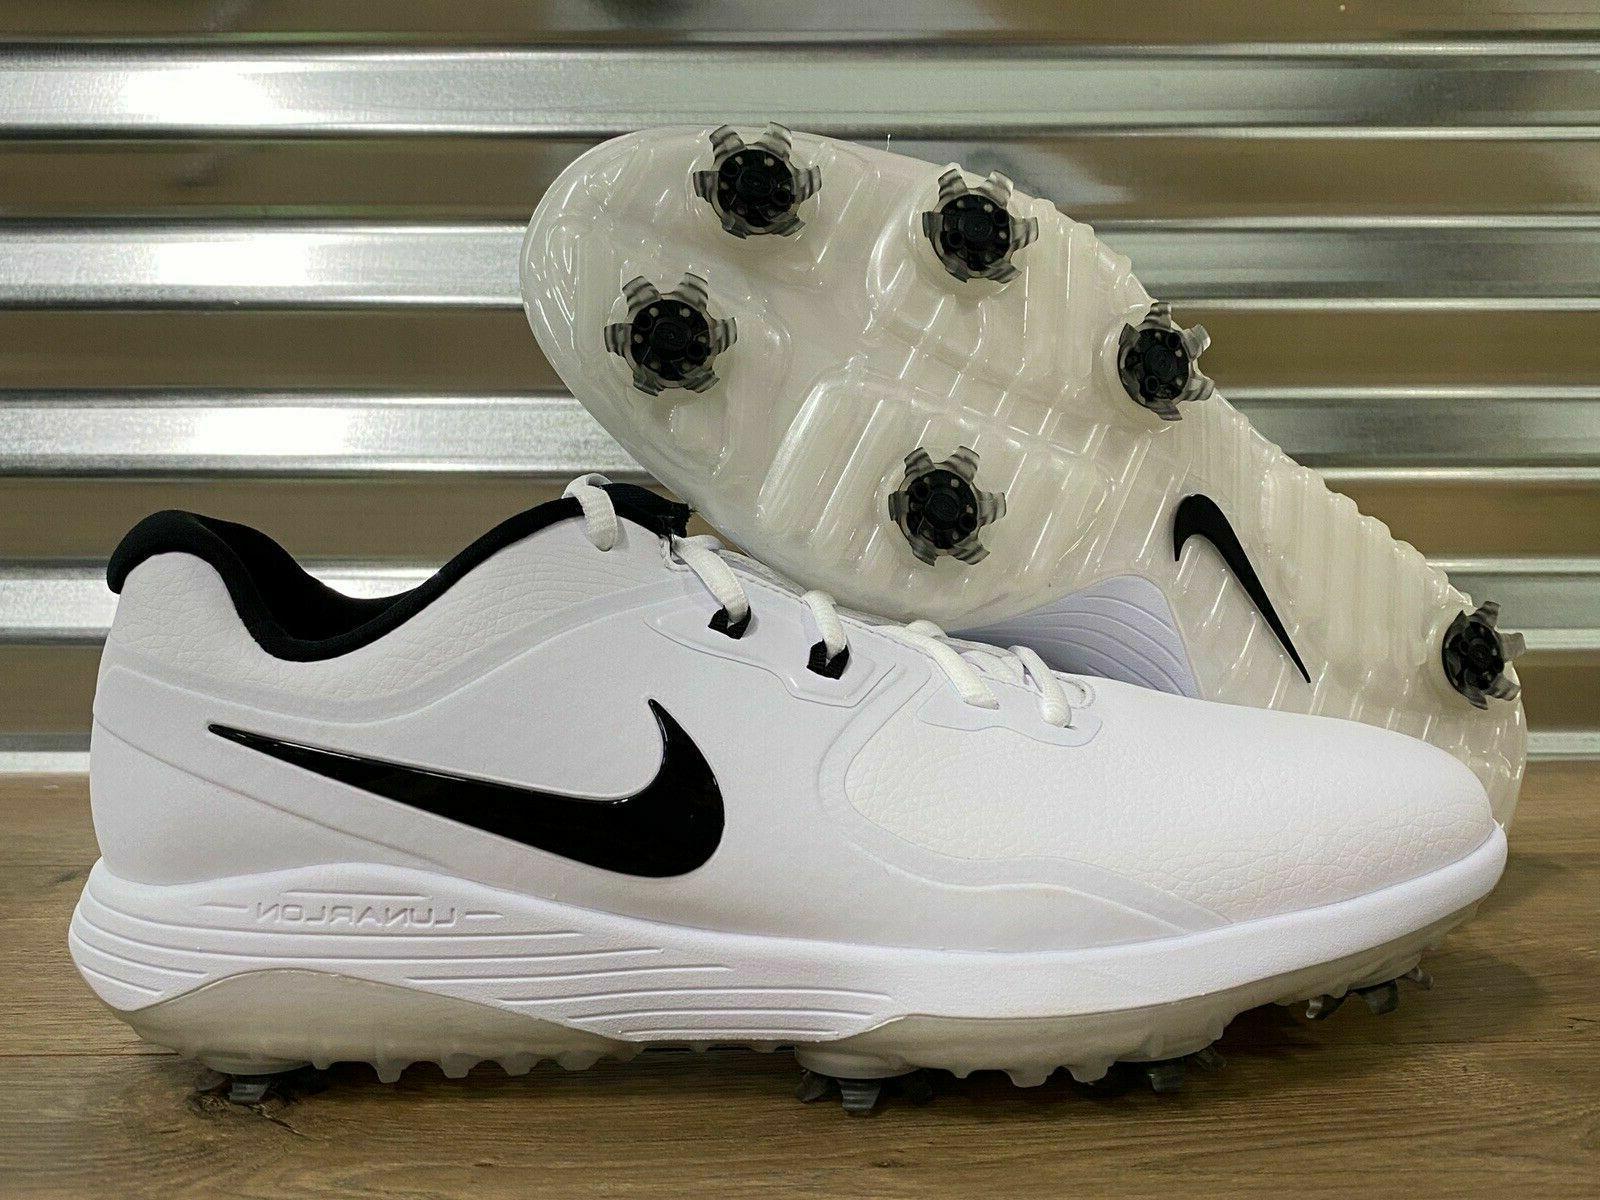 Nike Vapor Pro Golf Shoes White Black Lunarlon Authentic New